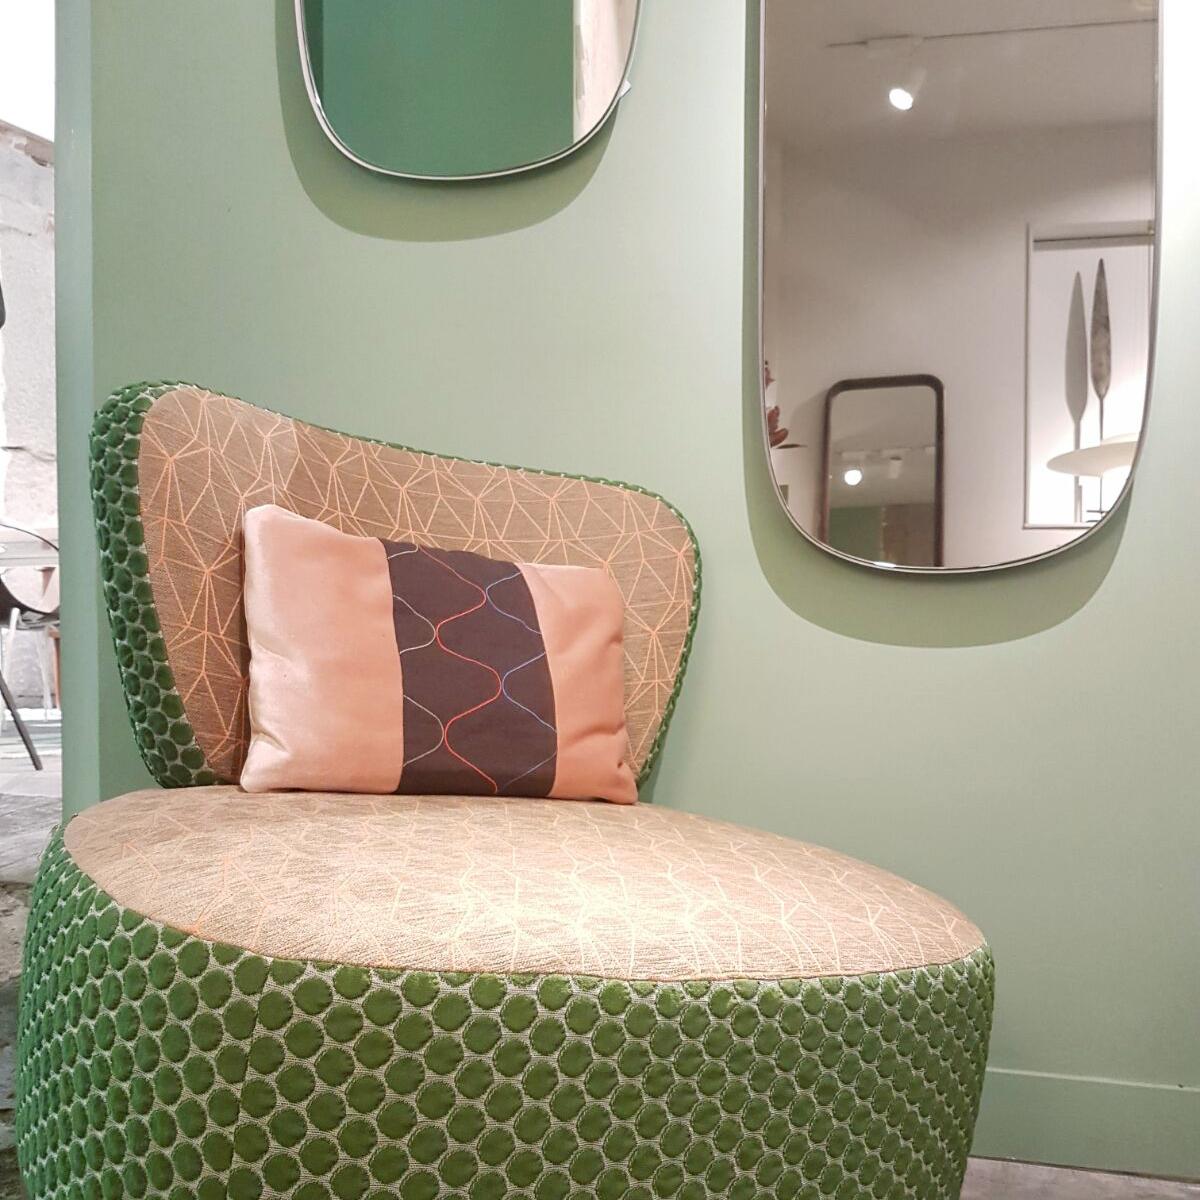 Butacas modernas para un dormitorio elegante blog de - Butacas para dormitorio ...